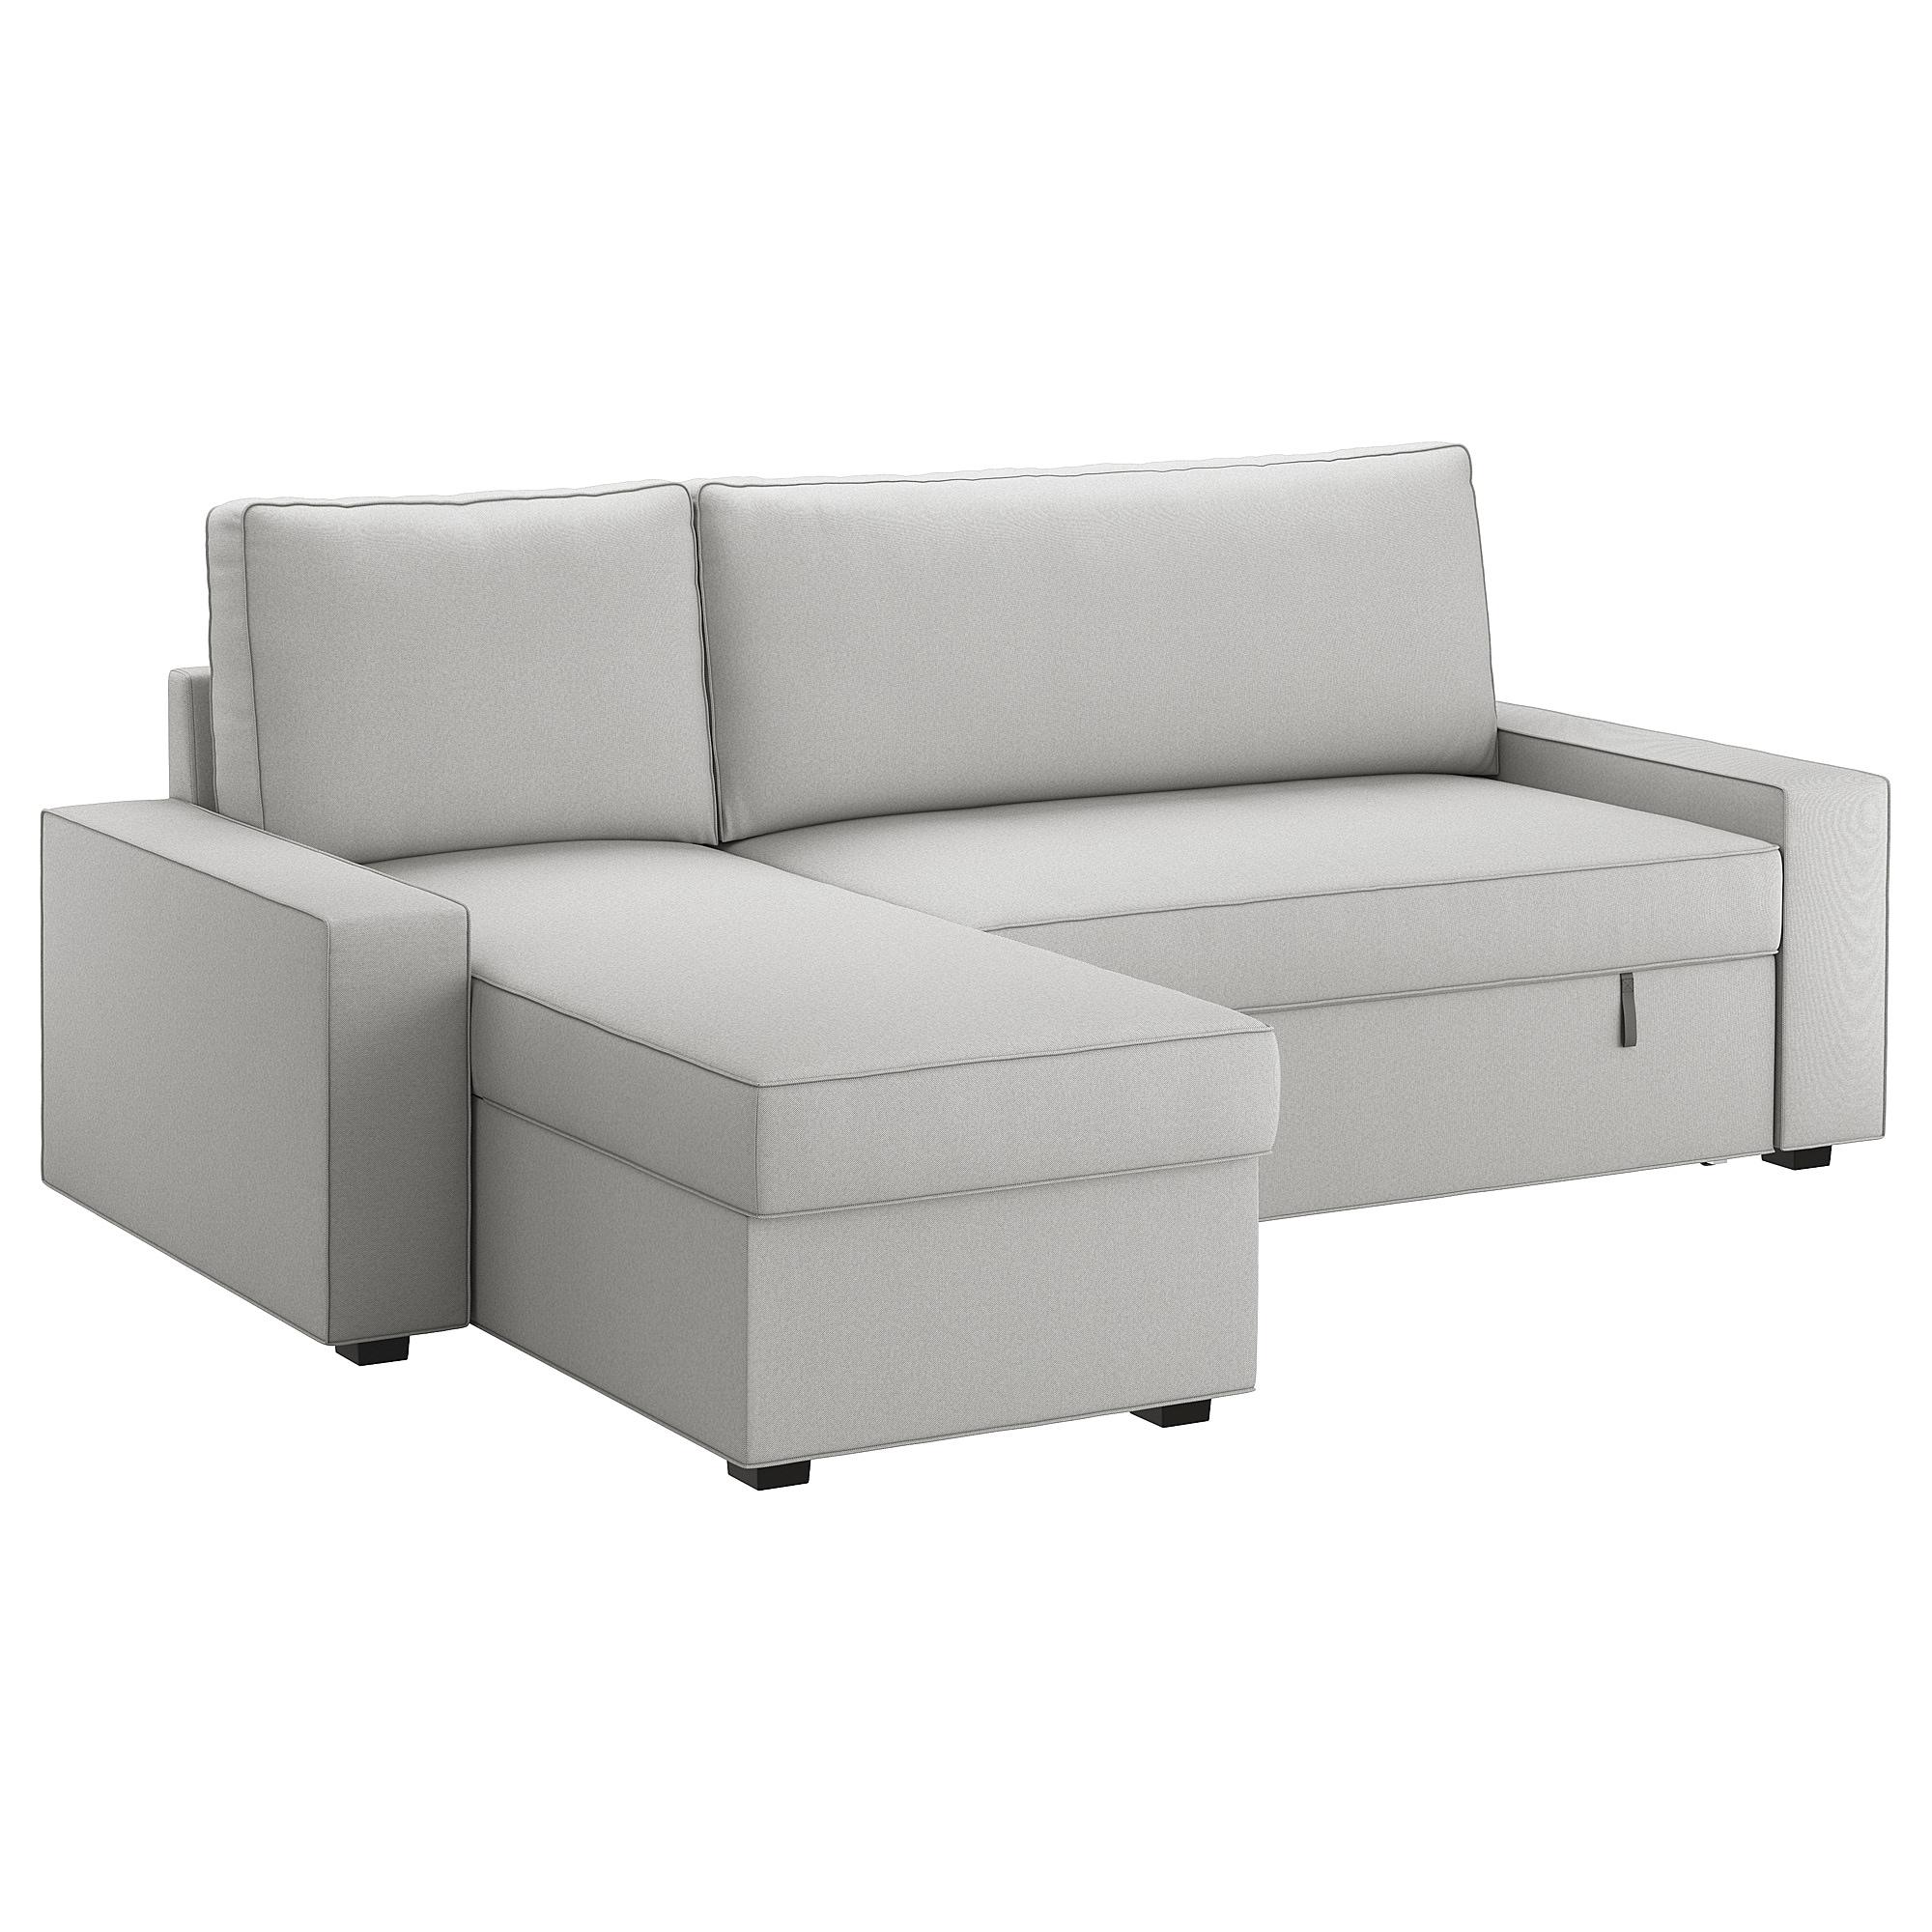 Ikea sofa Cama Chaise Longue X8d1 Vilasund sofa Bed with Chaise Longue orrsta Light Grey Ikea